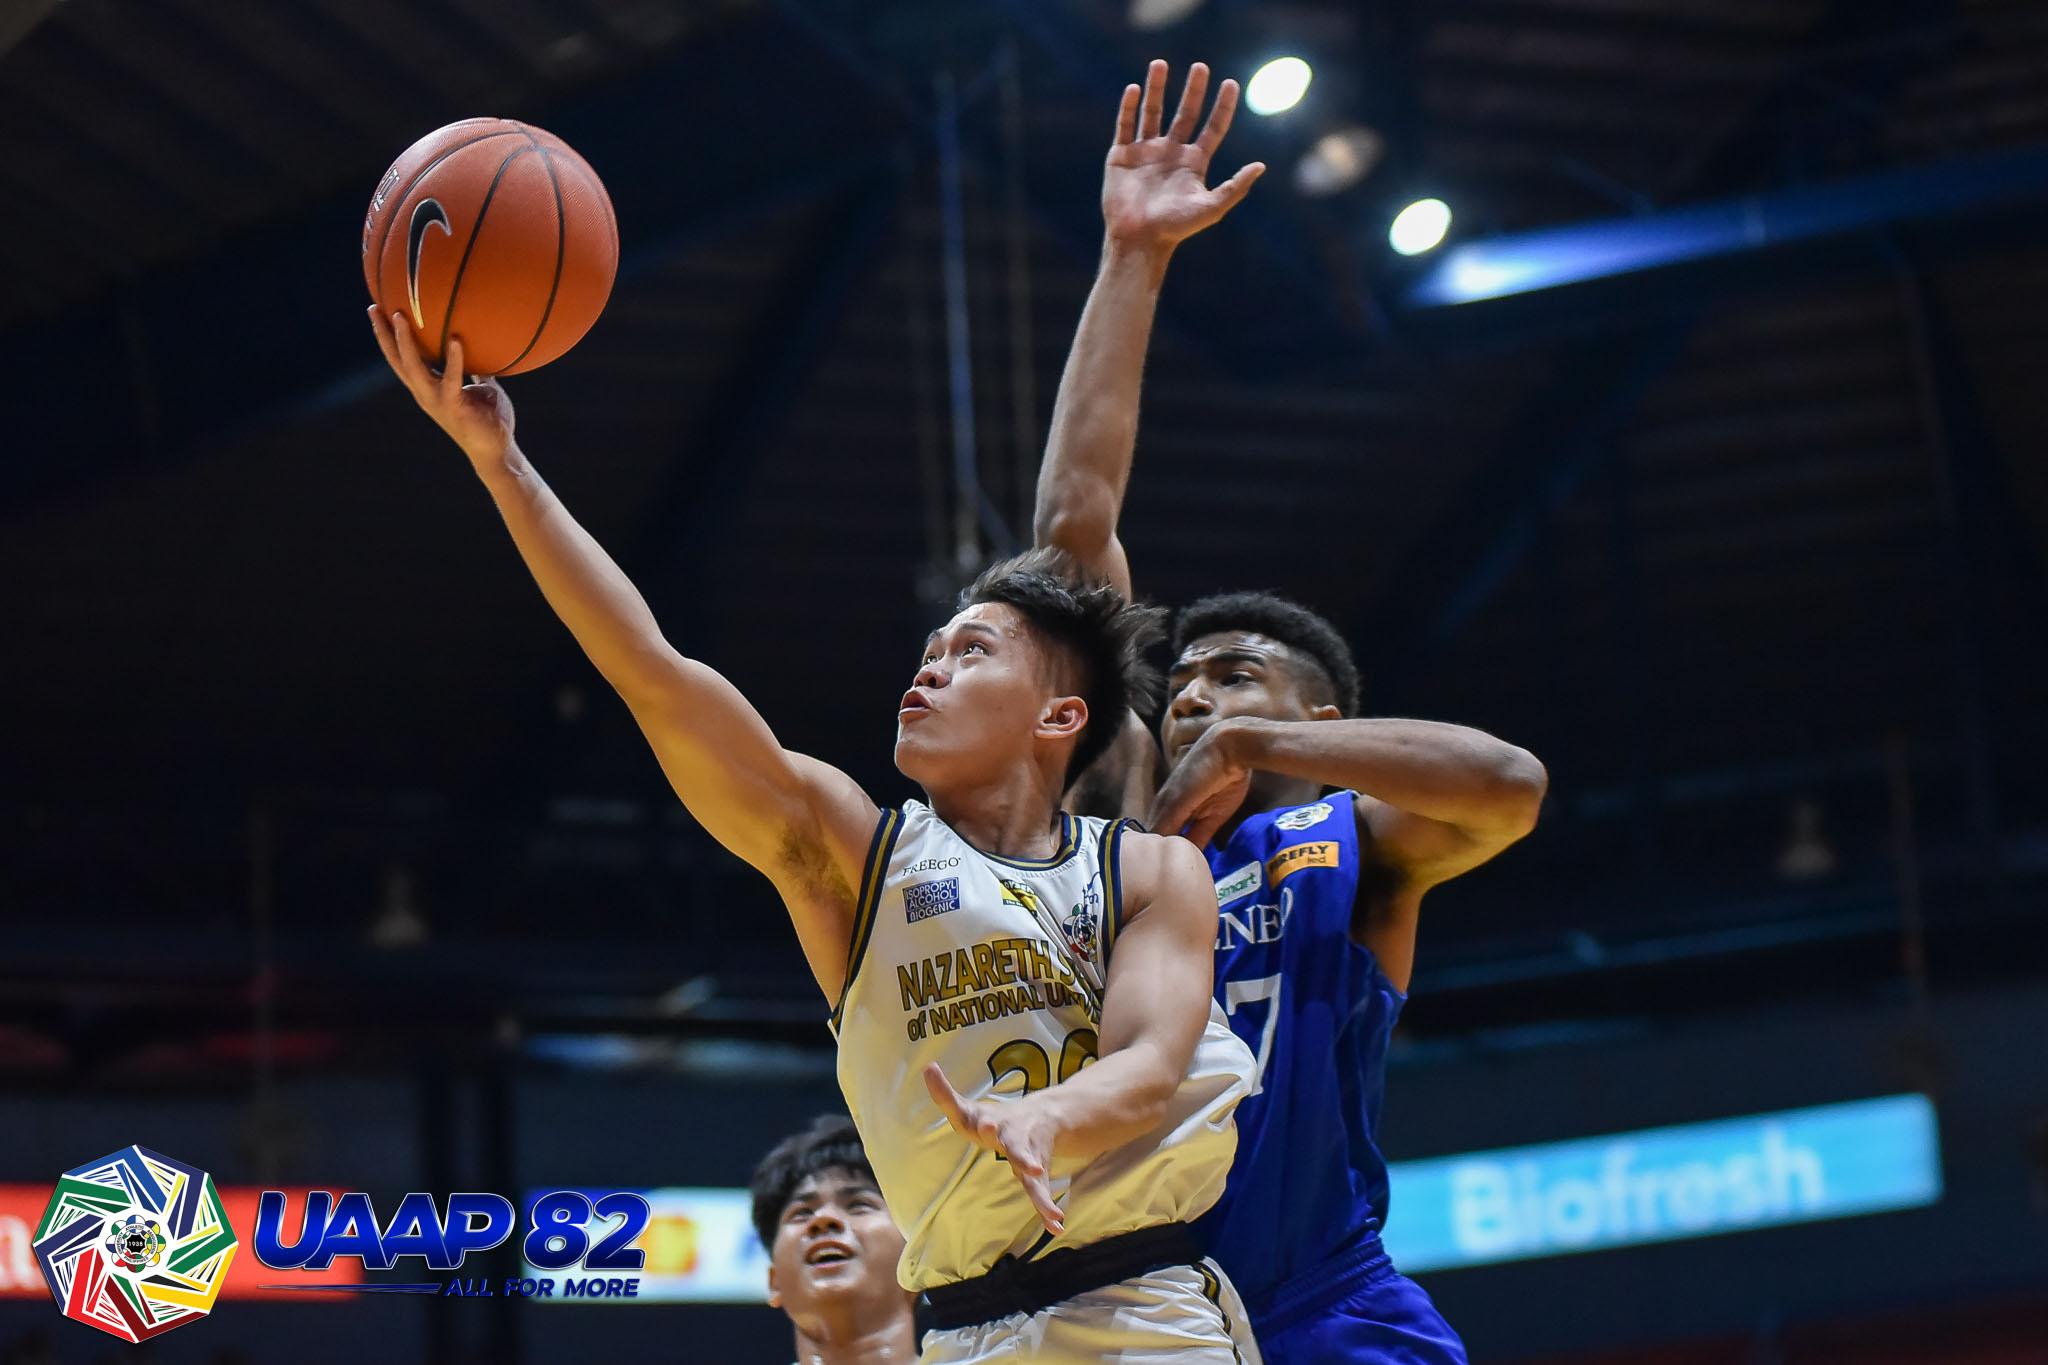 UAAP-Jrs-NSNU-vs.-ADMU-Felicilda-9947 Felicilda chooses to remain in NU Basketball News NU UAAP  - philippine sports news